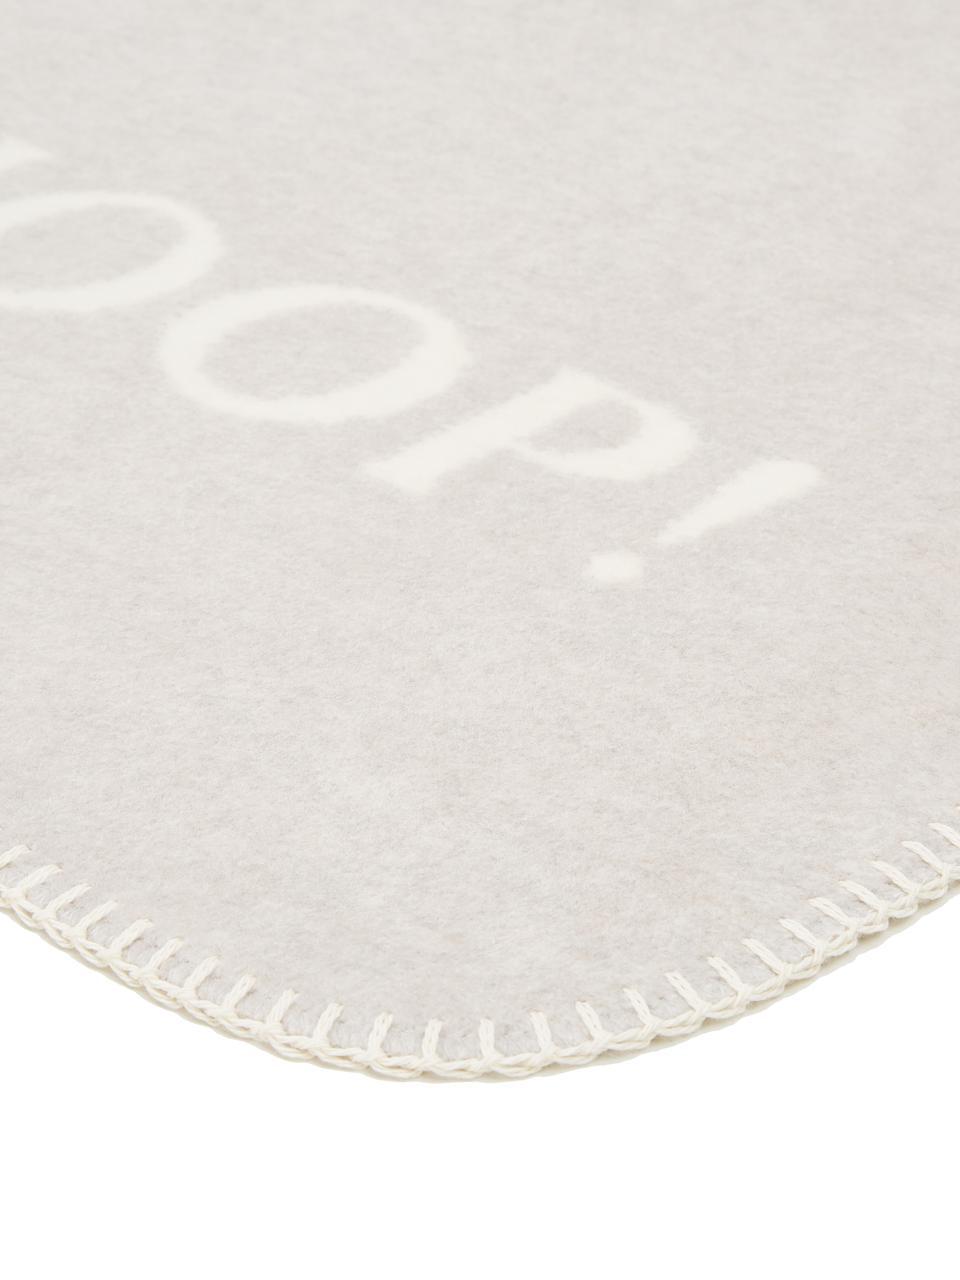 Plaid in pile reversibile Uni Doubleface, 58% cotone, 35% poliacrilico, 7% poliestere, Grigio, ecru, Larg. 150 x Lung. 200 cm